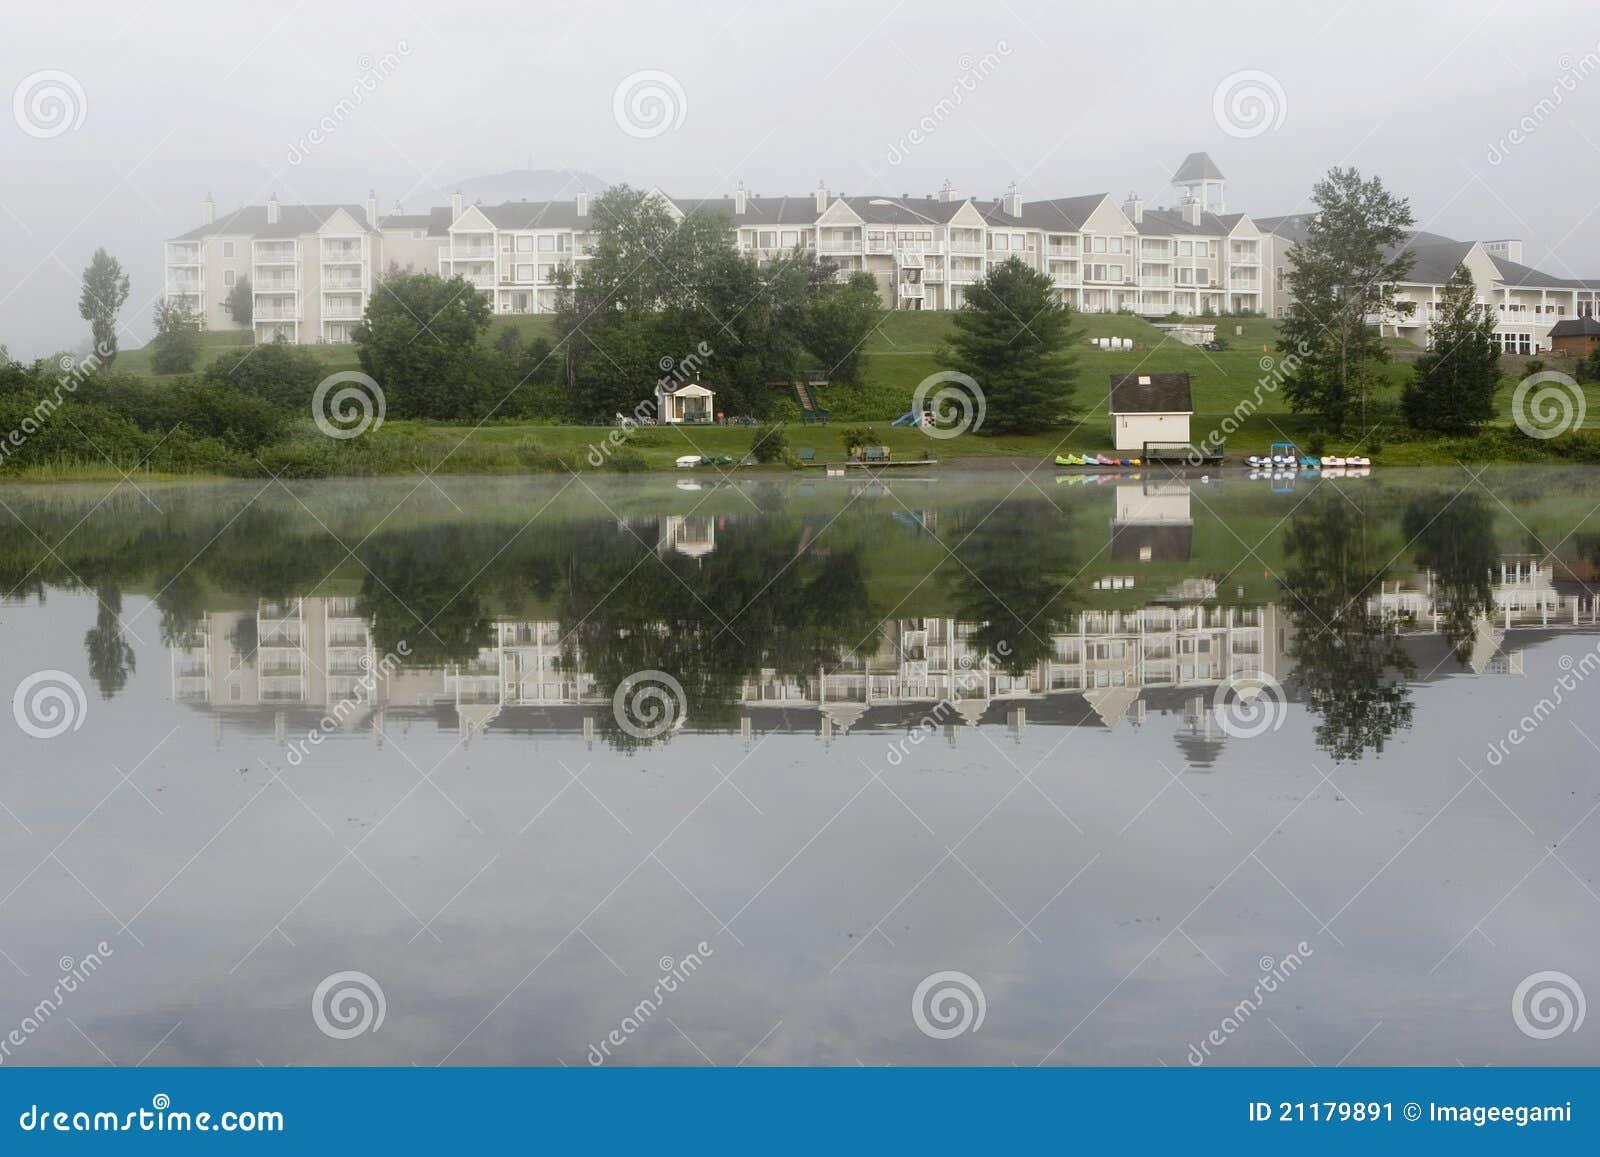 Lakefront hotel